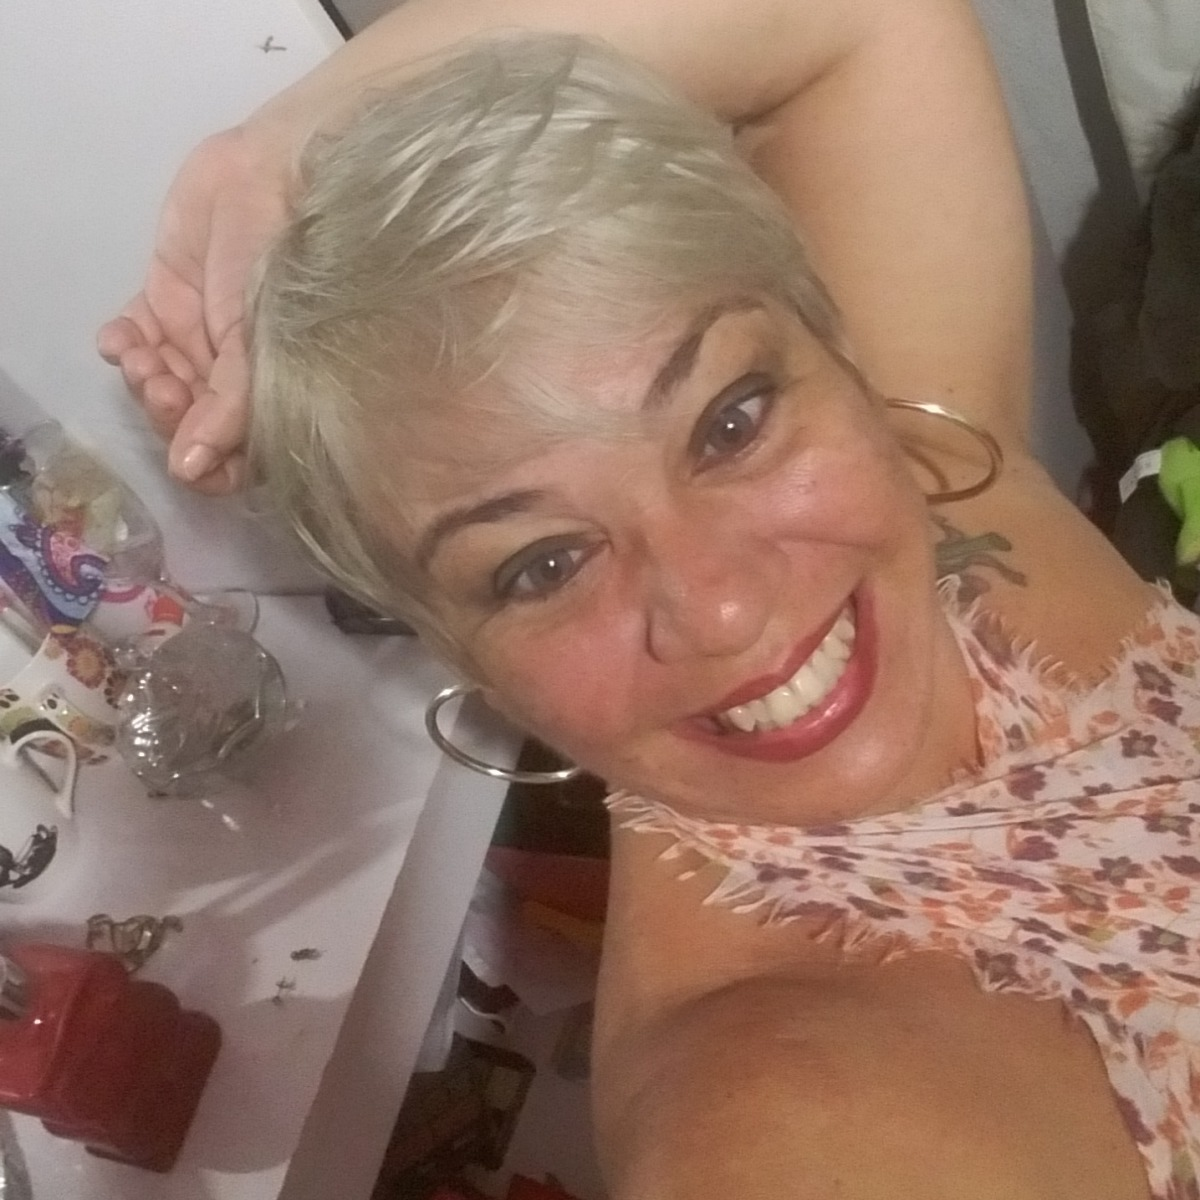 Jurema Lira Buannafina Ramos